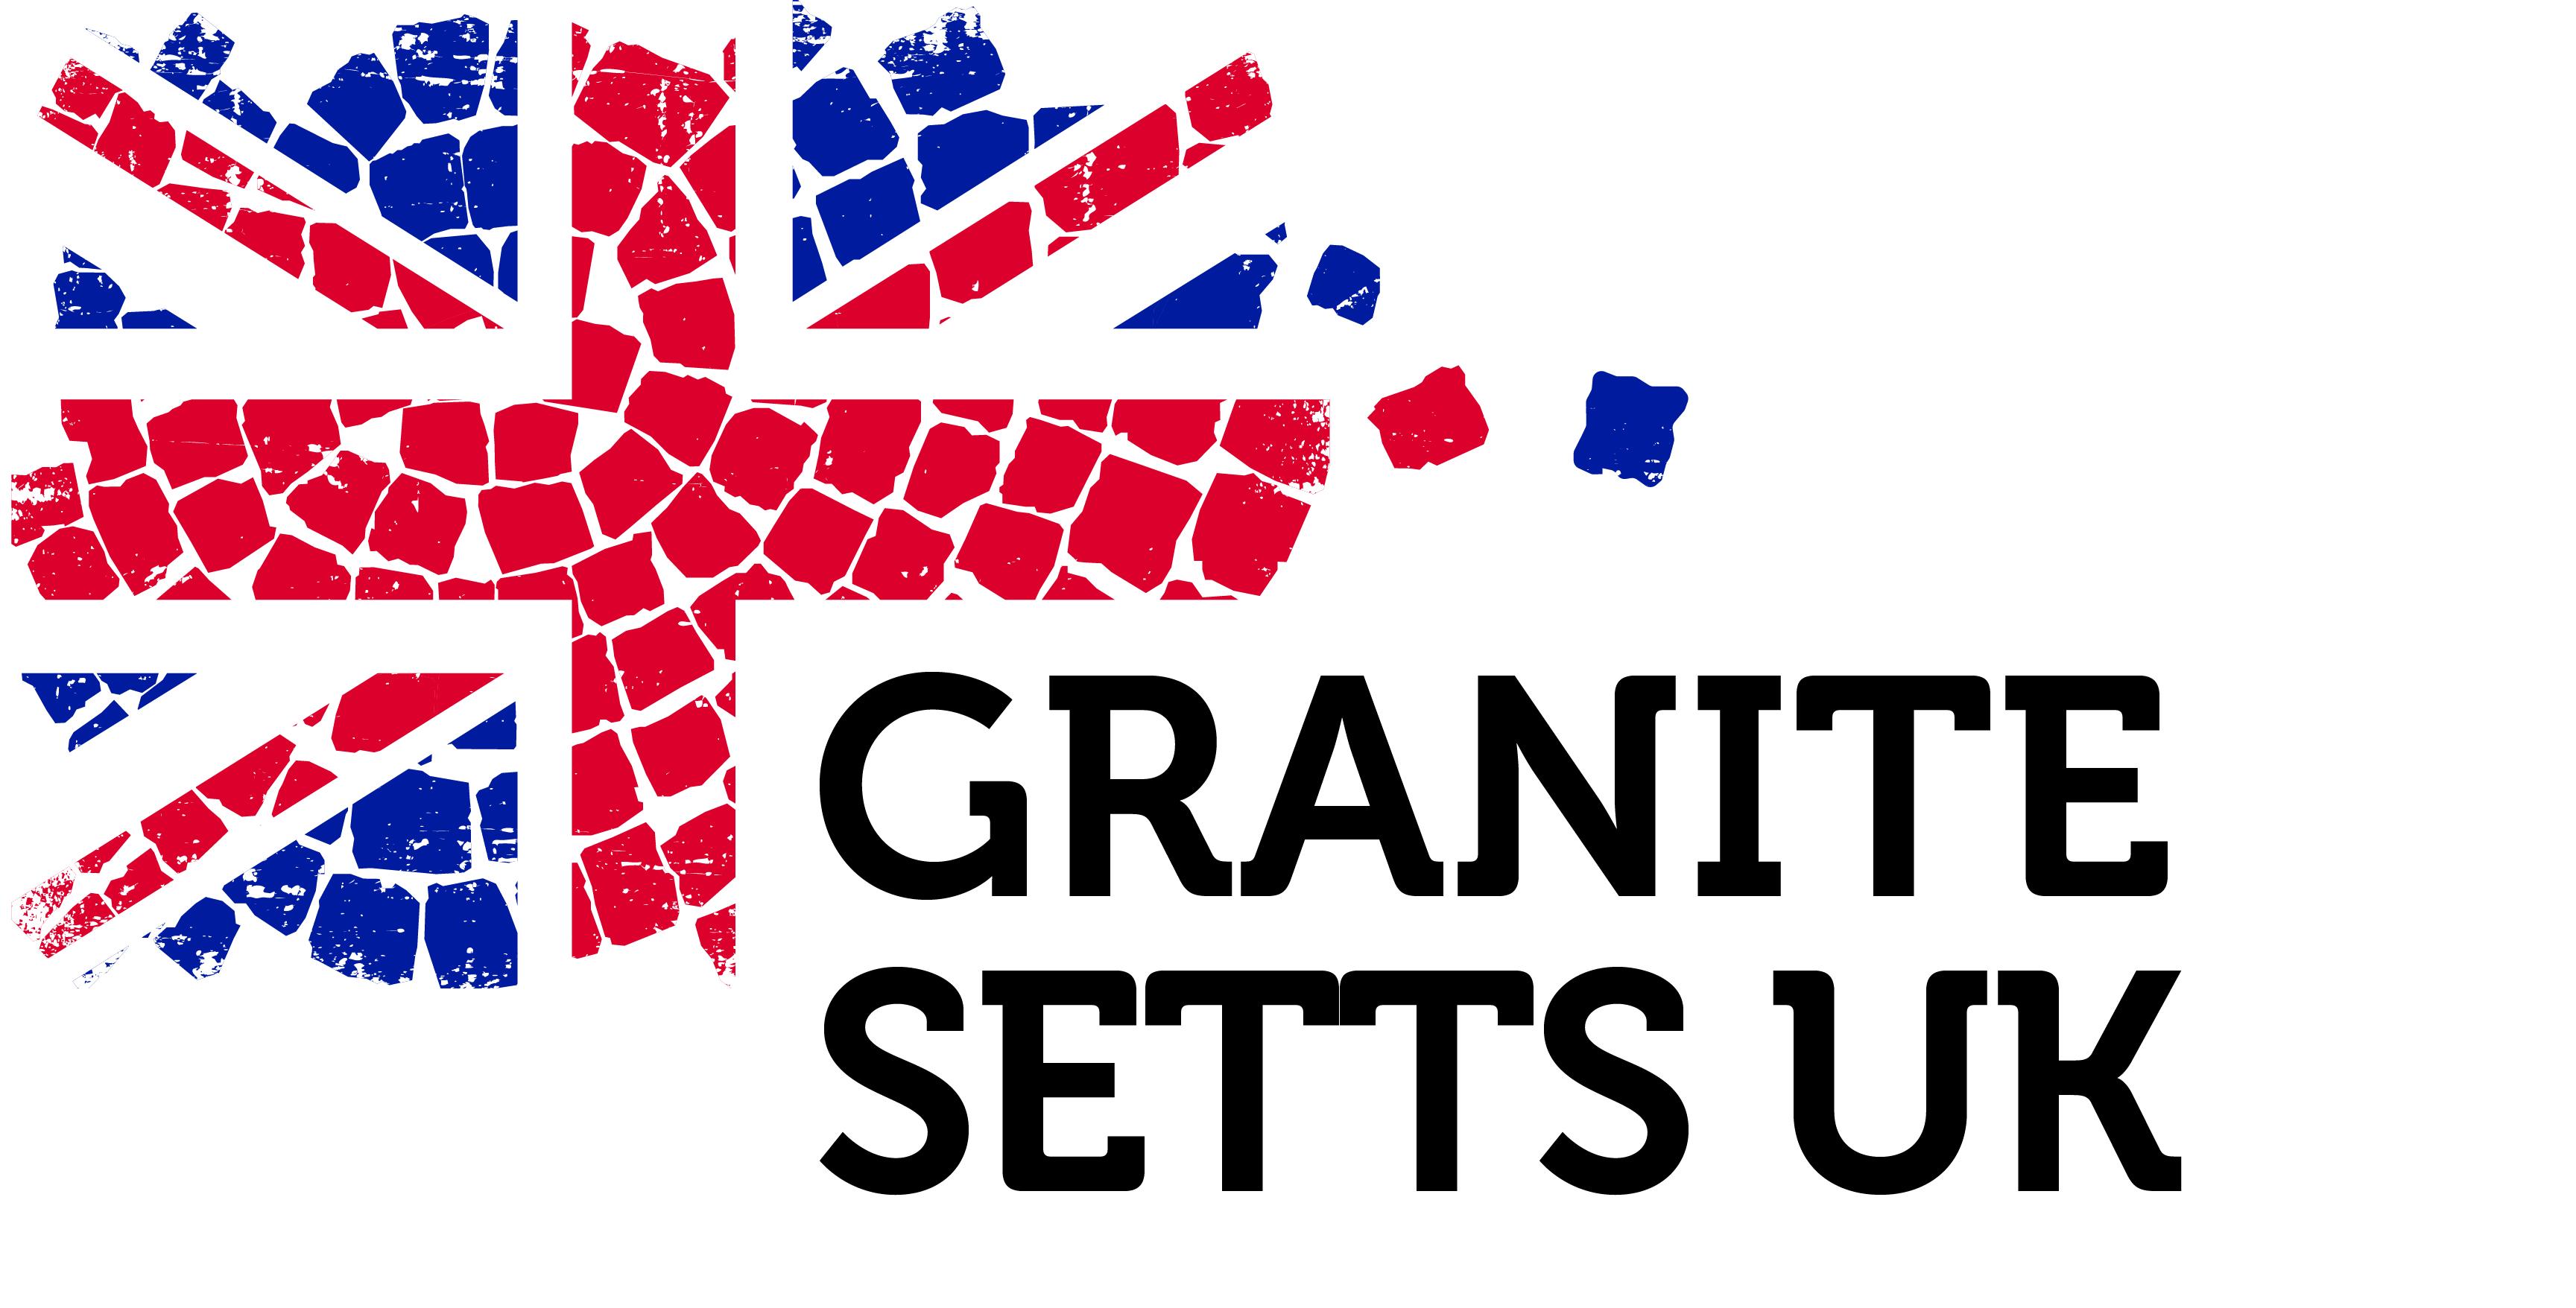 Granite Setts UK